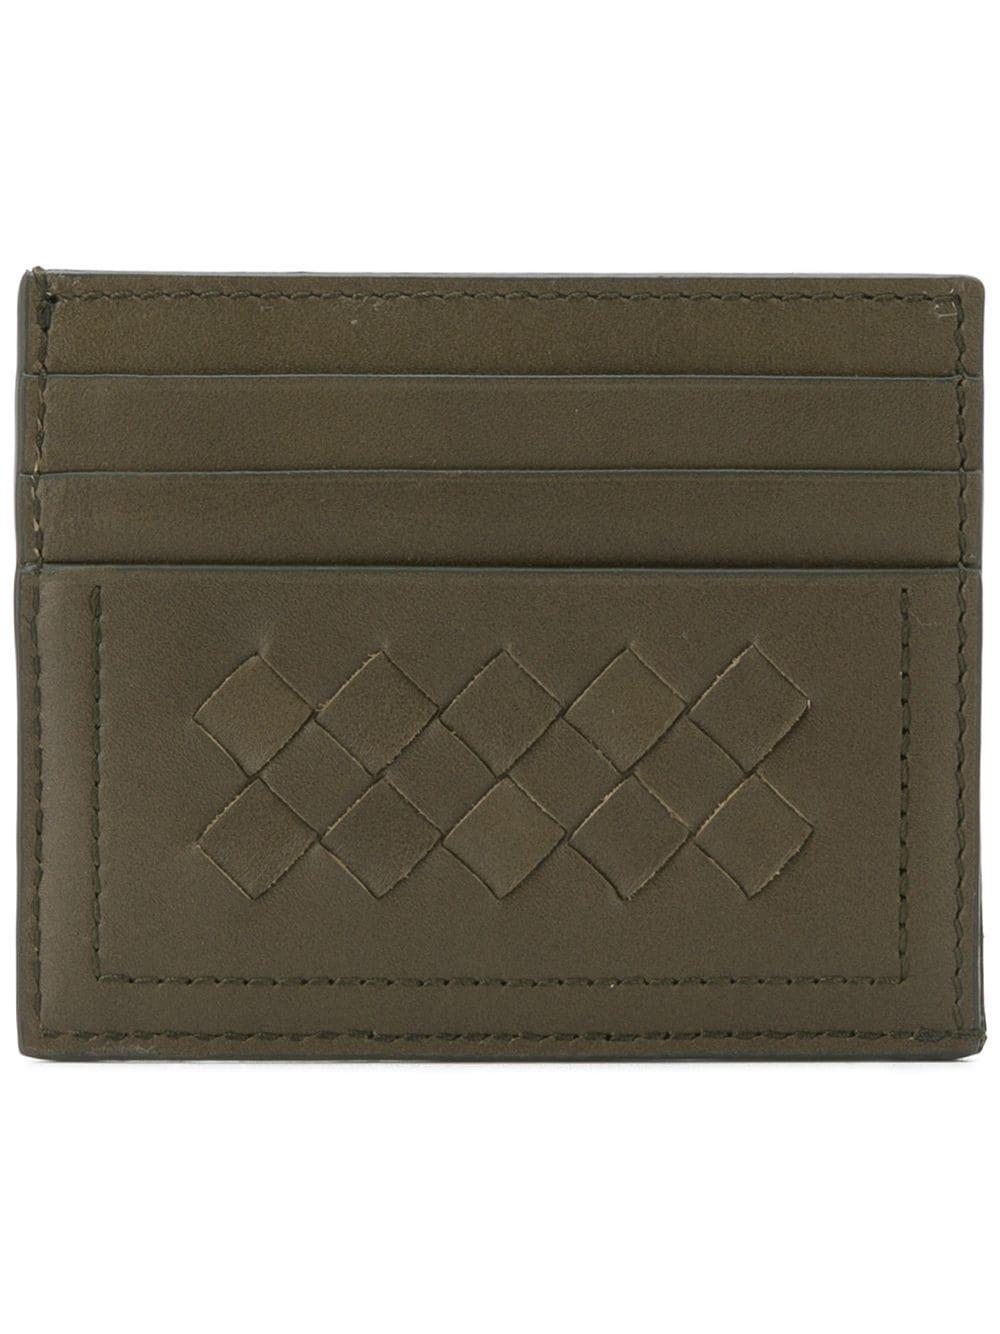 62dcd98af0 Bottega Veneta Bi-Fold Intrecciato Wallet - Green